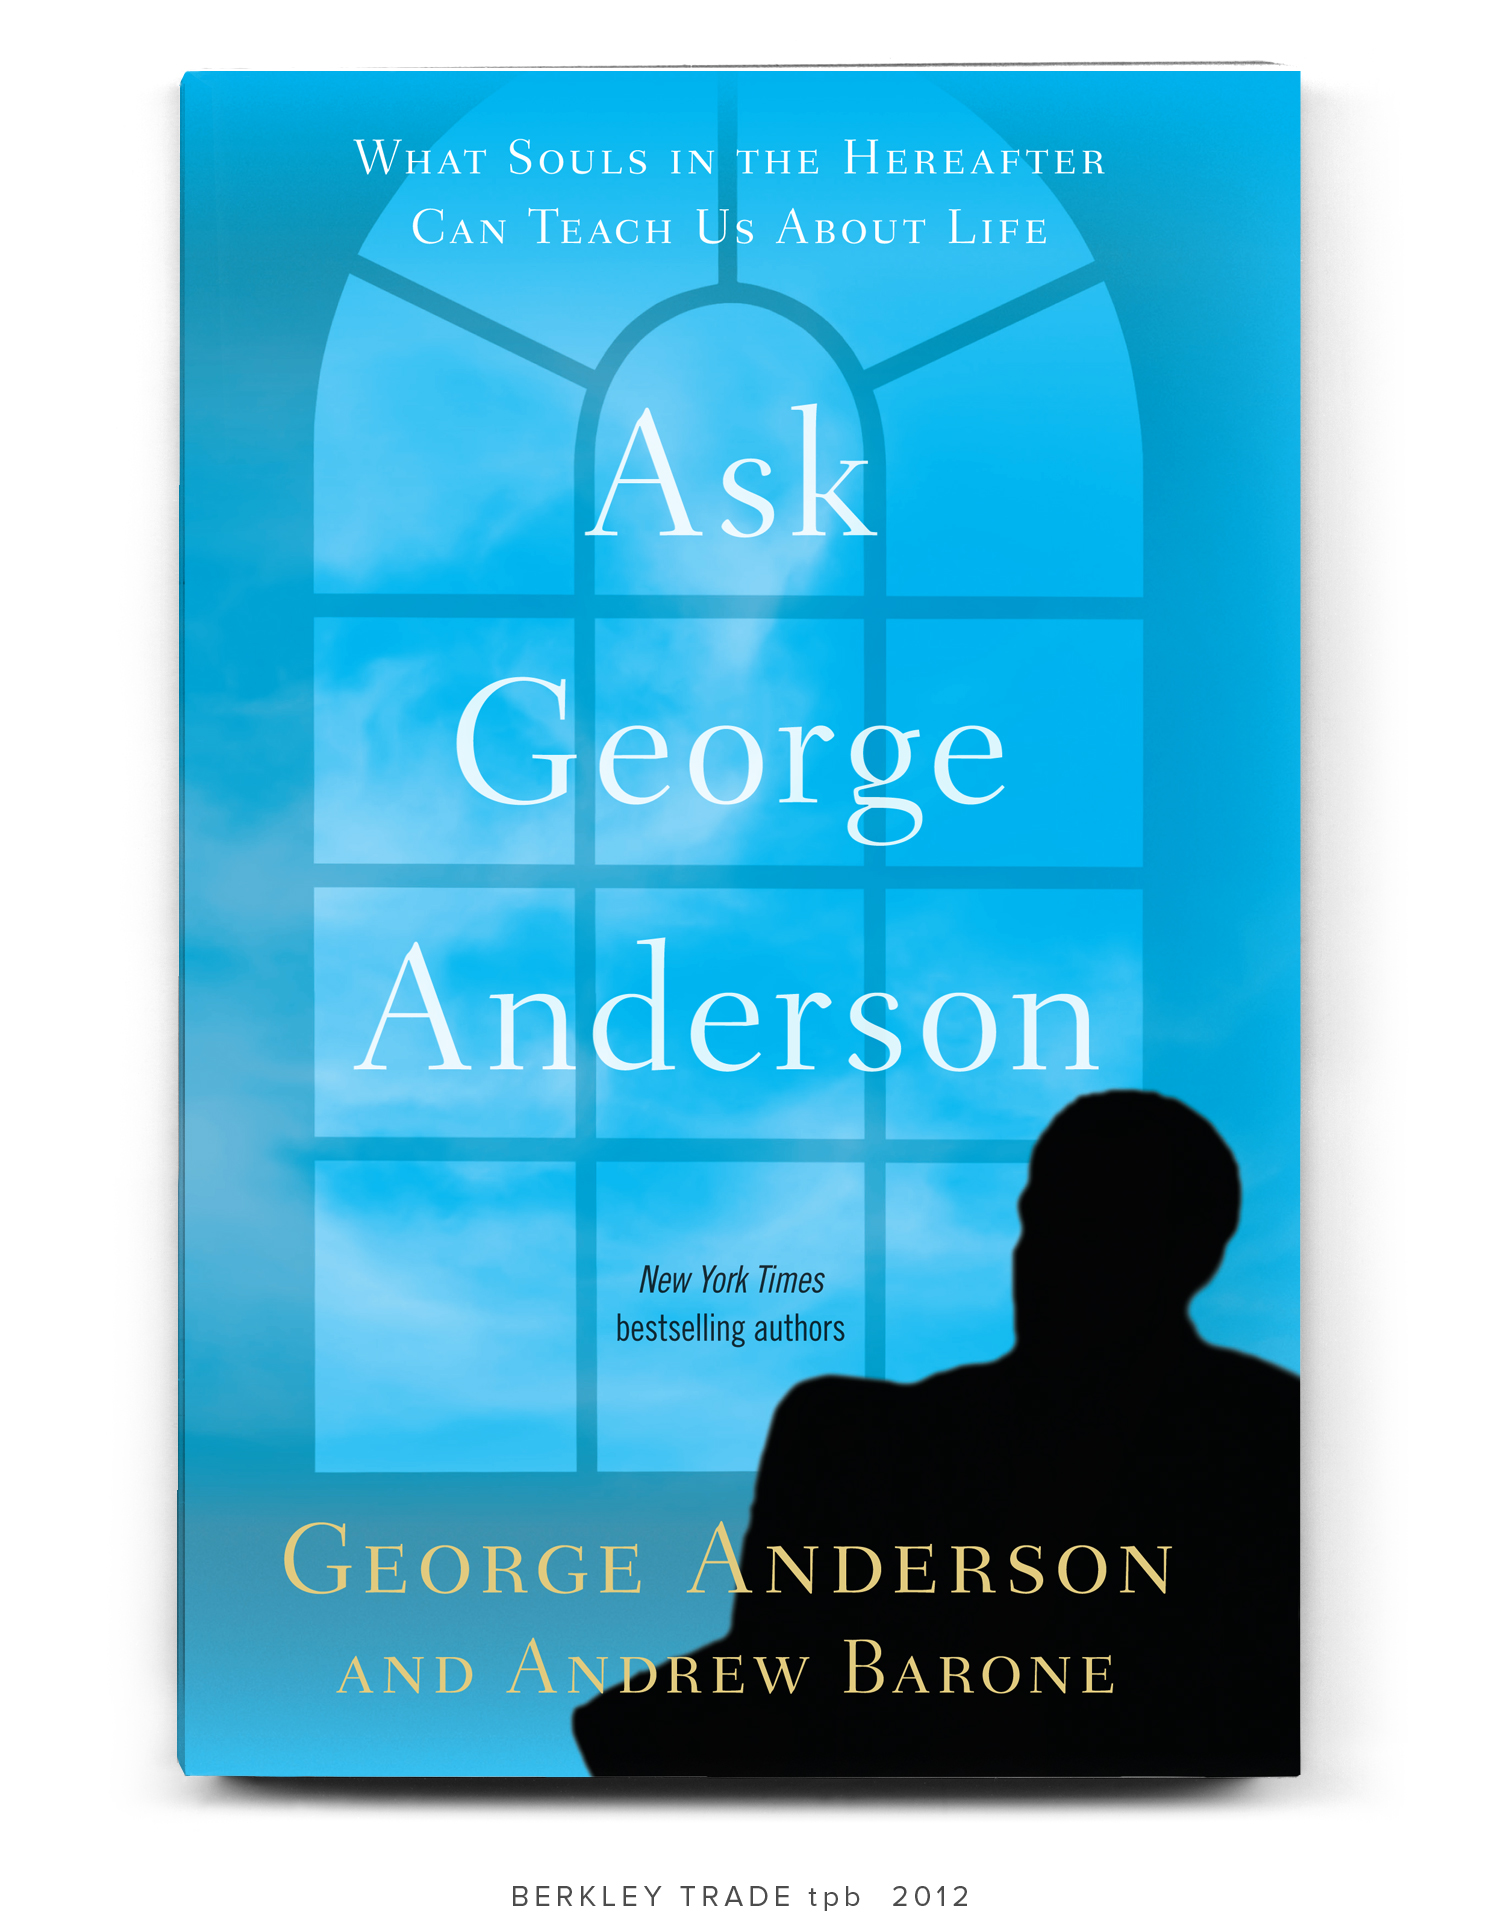 ASK-GEORGE-ANDERSON-tpb-ss6.jpg